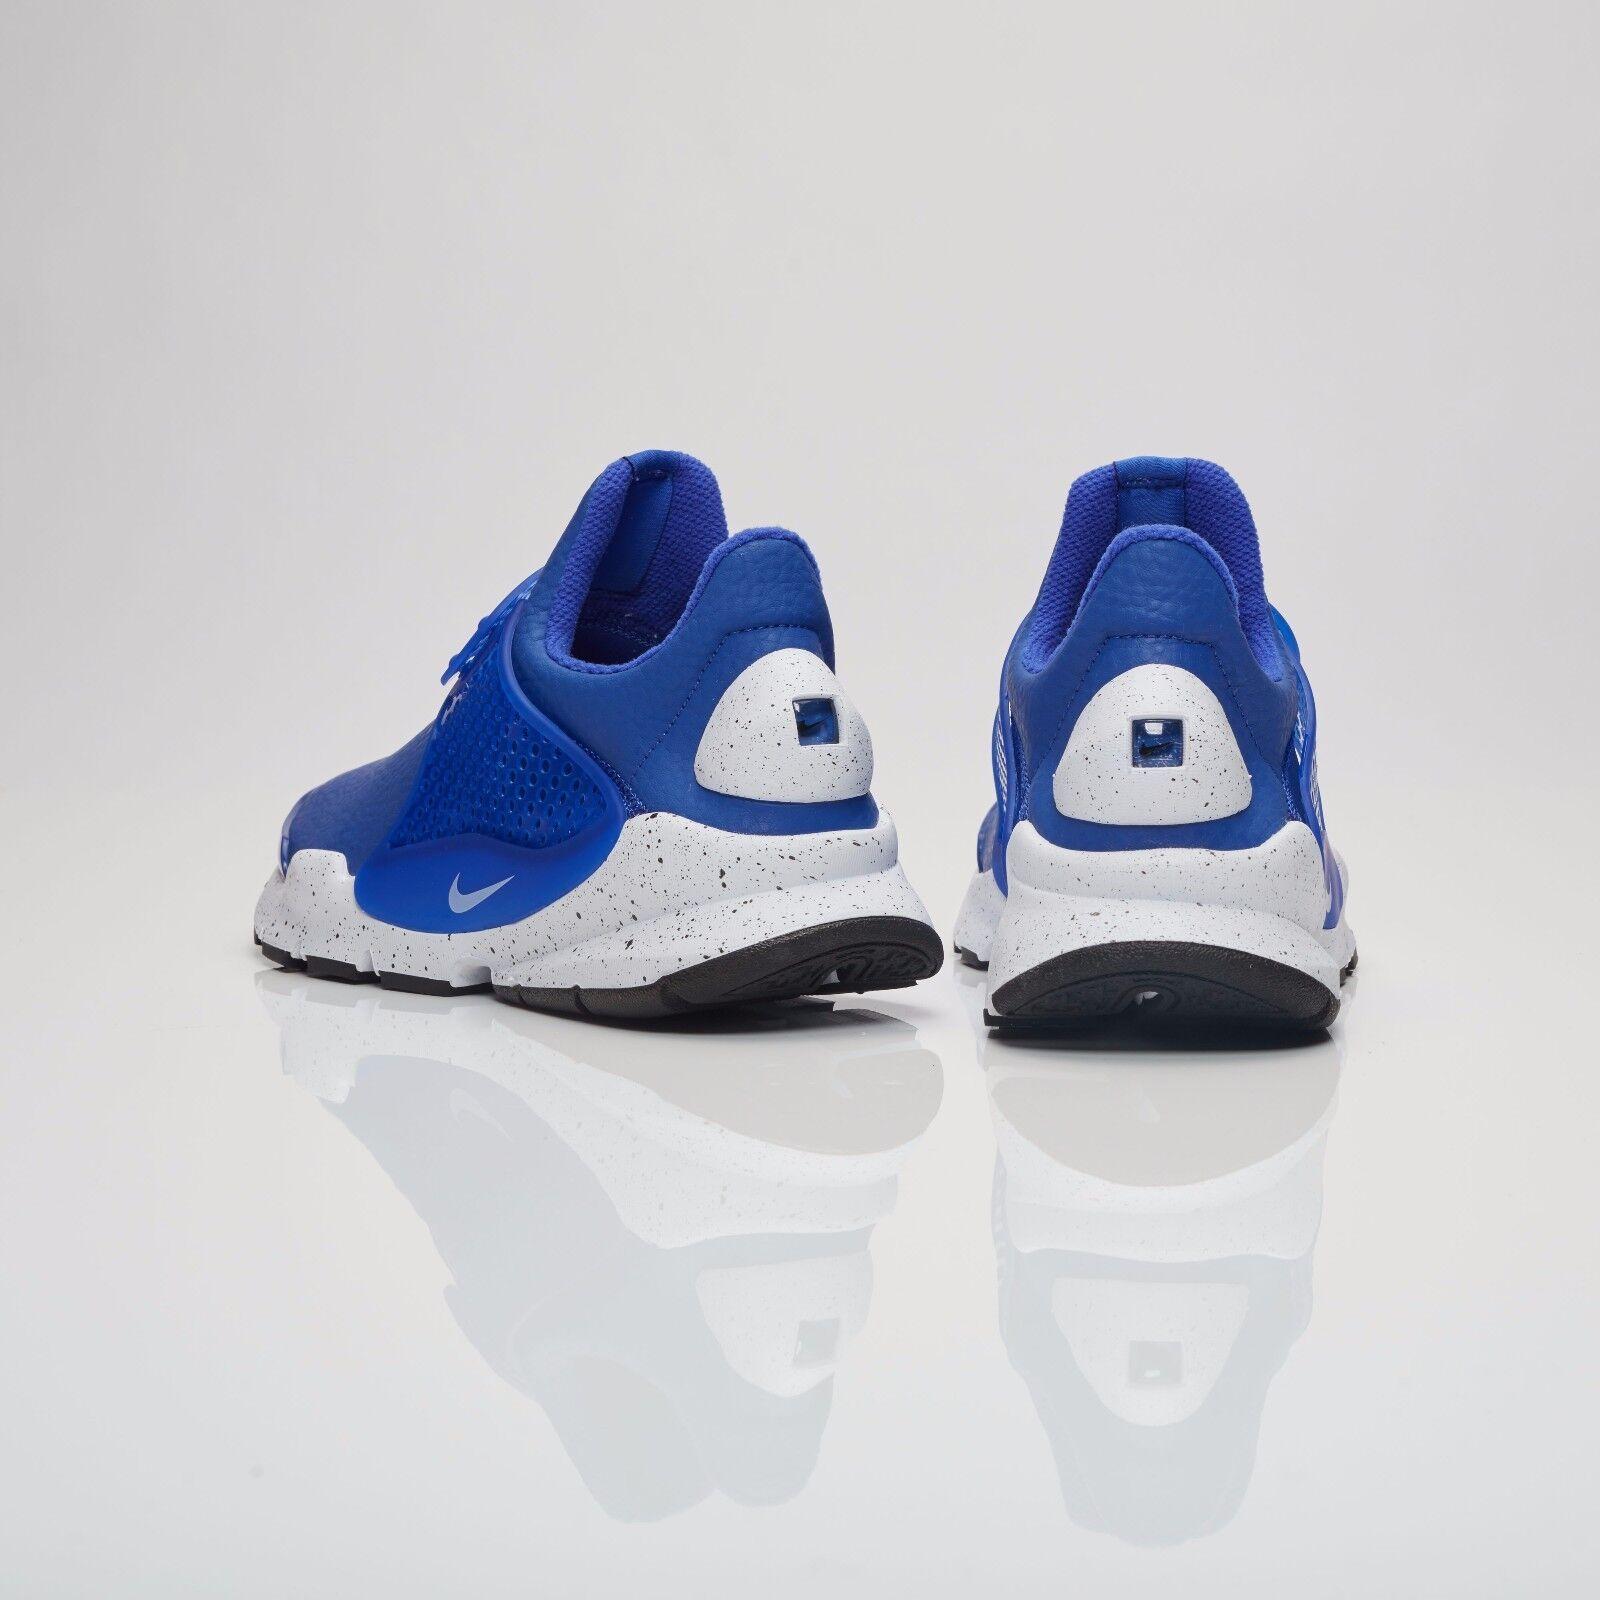 Nike WOMEN'S Sock Sock Sock Dart Premium Paramount bluee SIZE 5 BRAND NEW 58281e